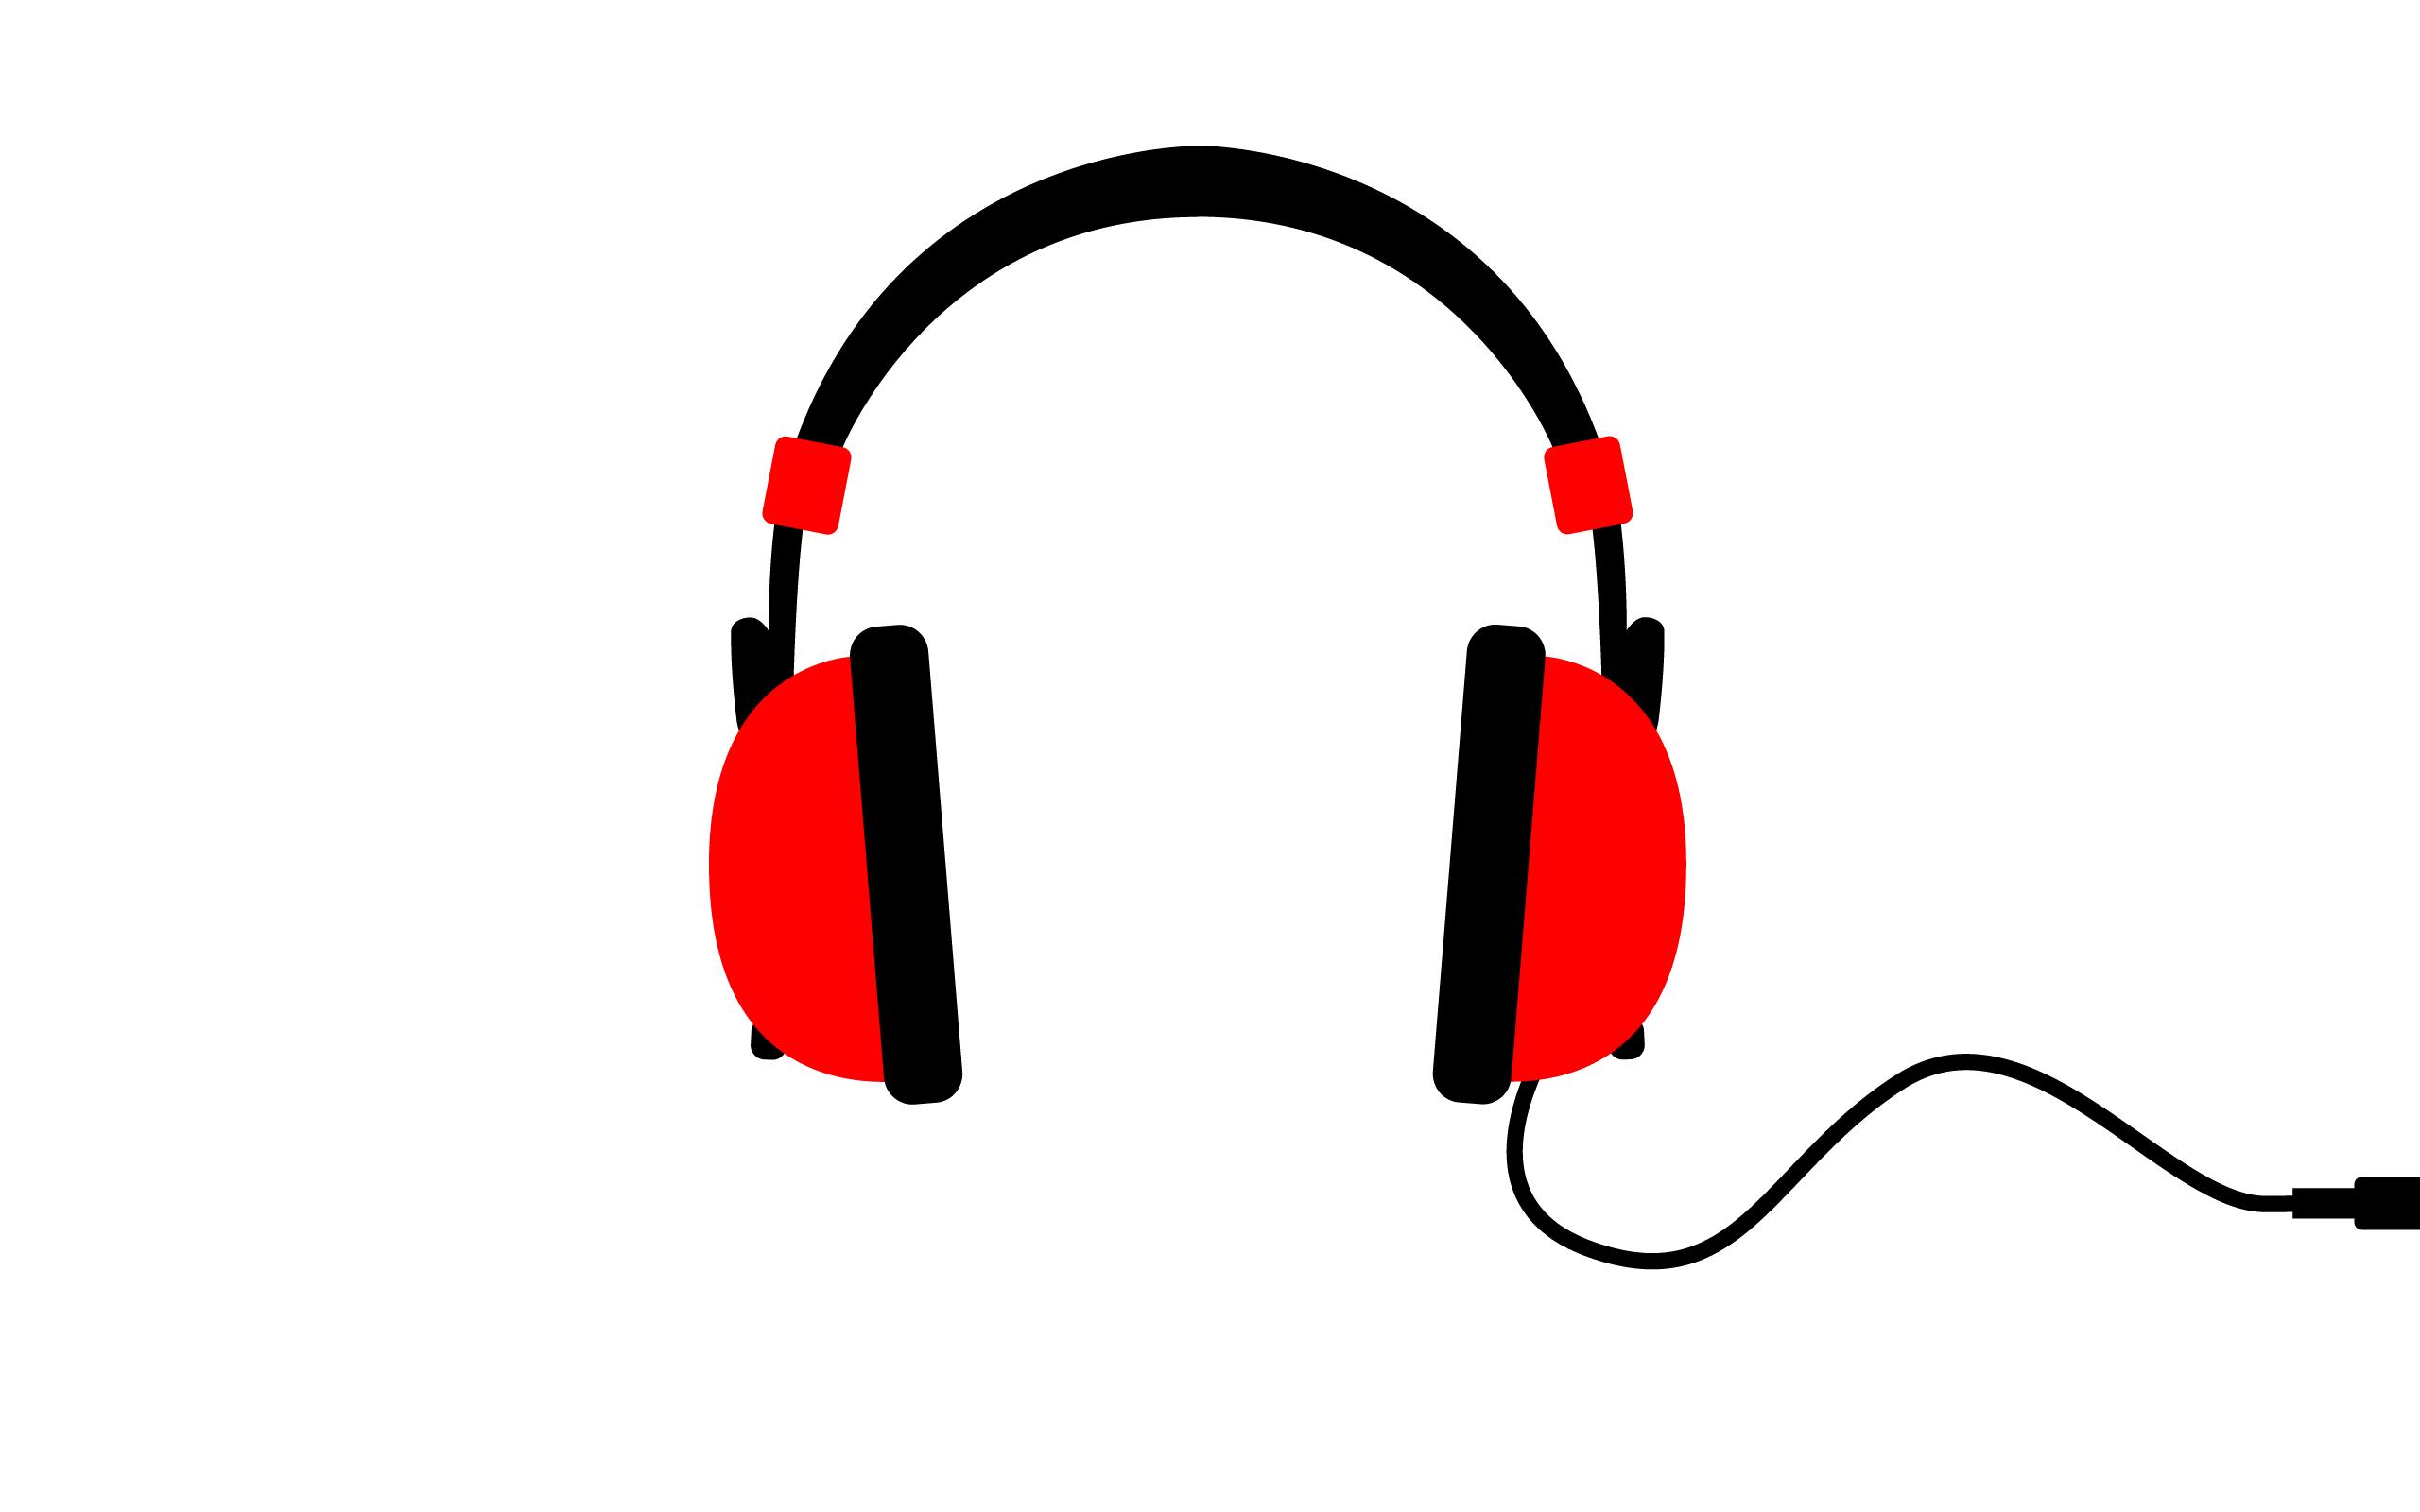 Headphones PNG Images Transparent Free Download.